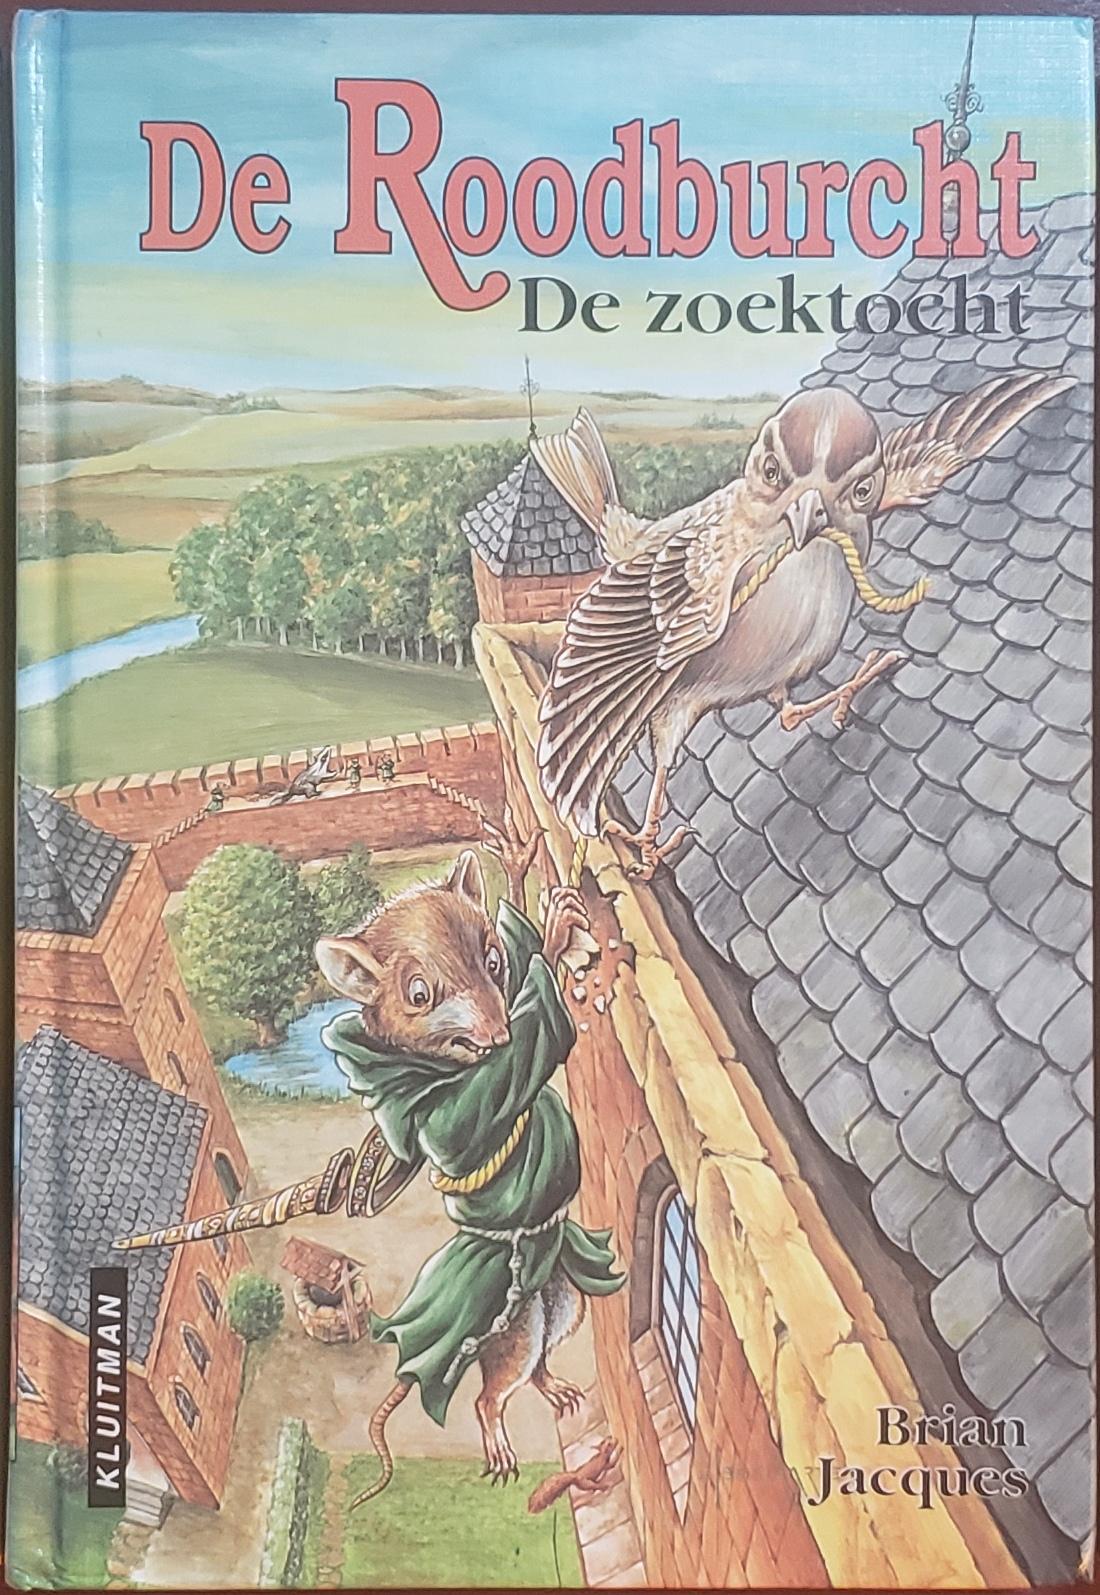 File:DutchRedwall1994-2.jpg